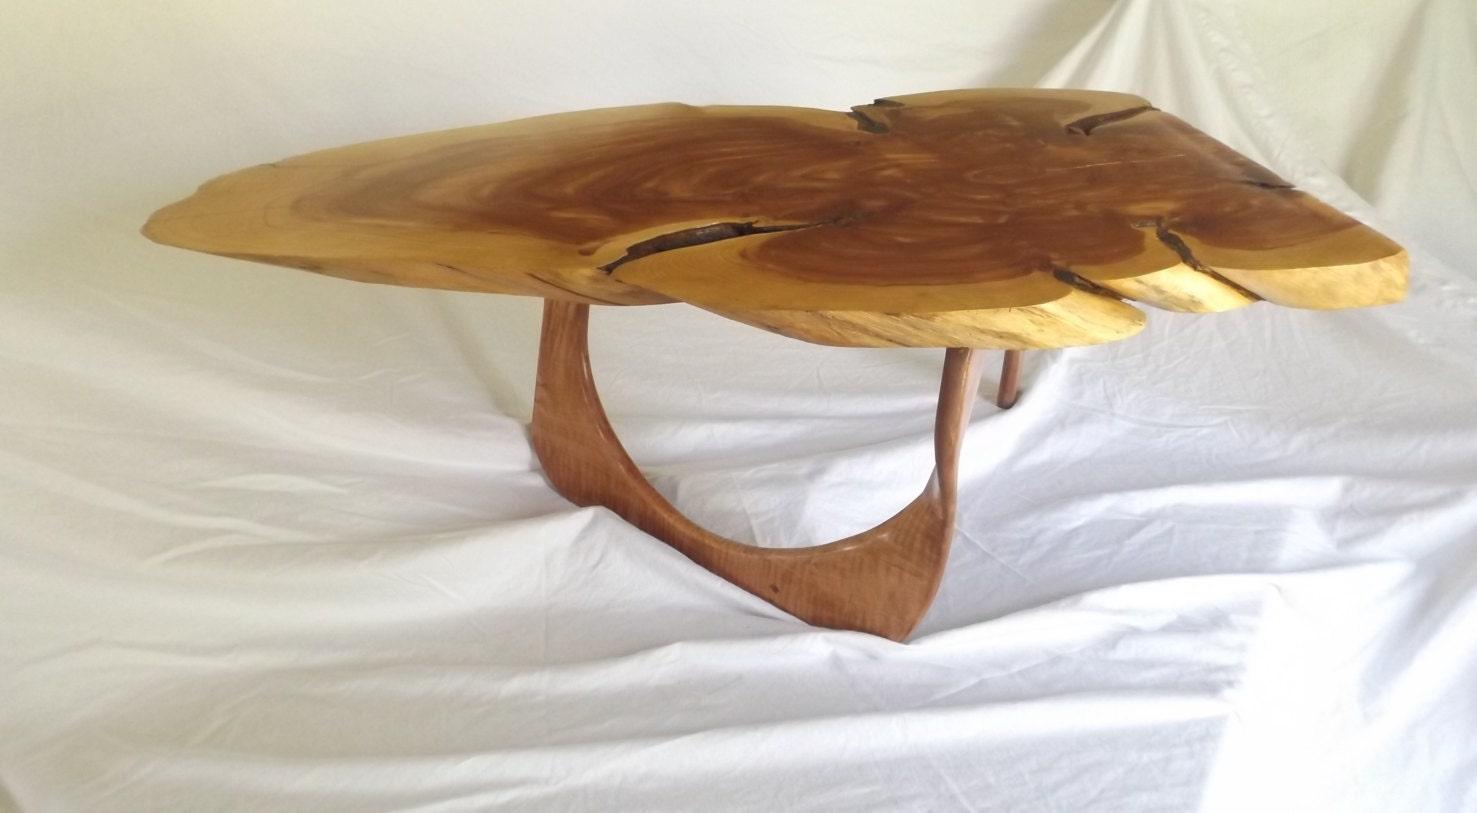 Live Edge Red Cedar Coffee Table By Fishboneworkshop On Etsy